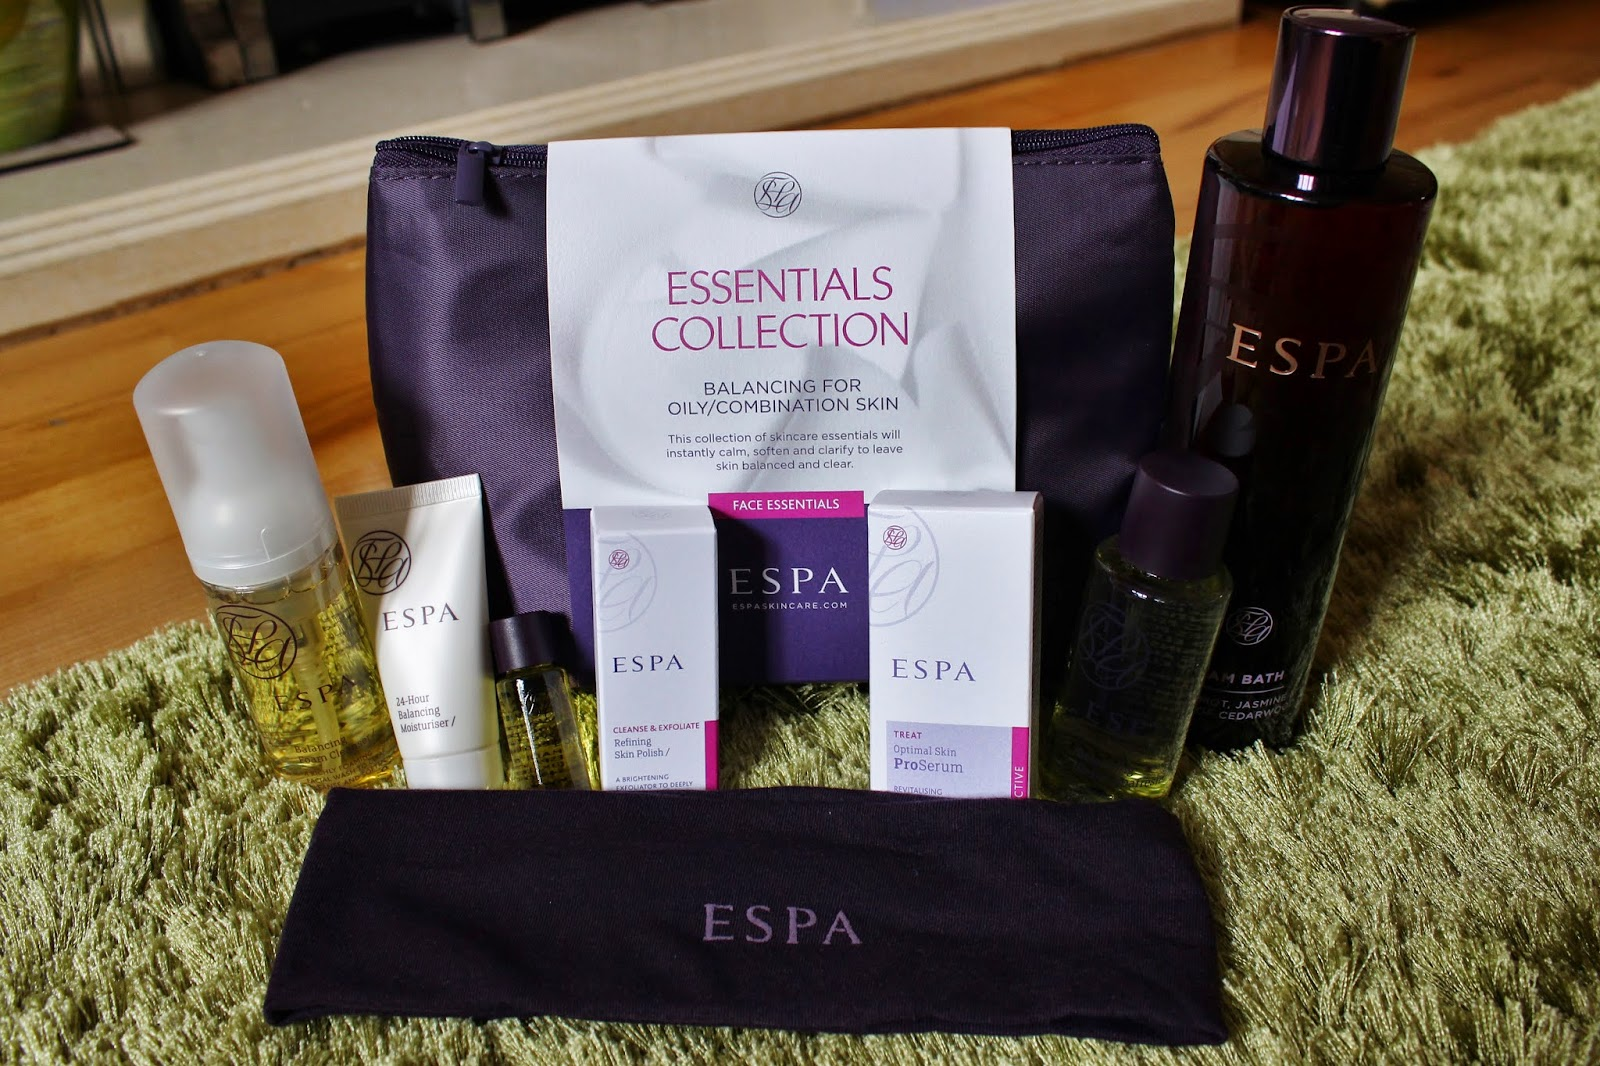 ESPA Essentials Collection